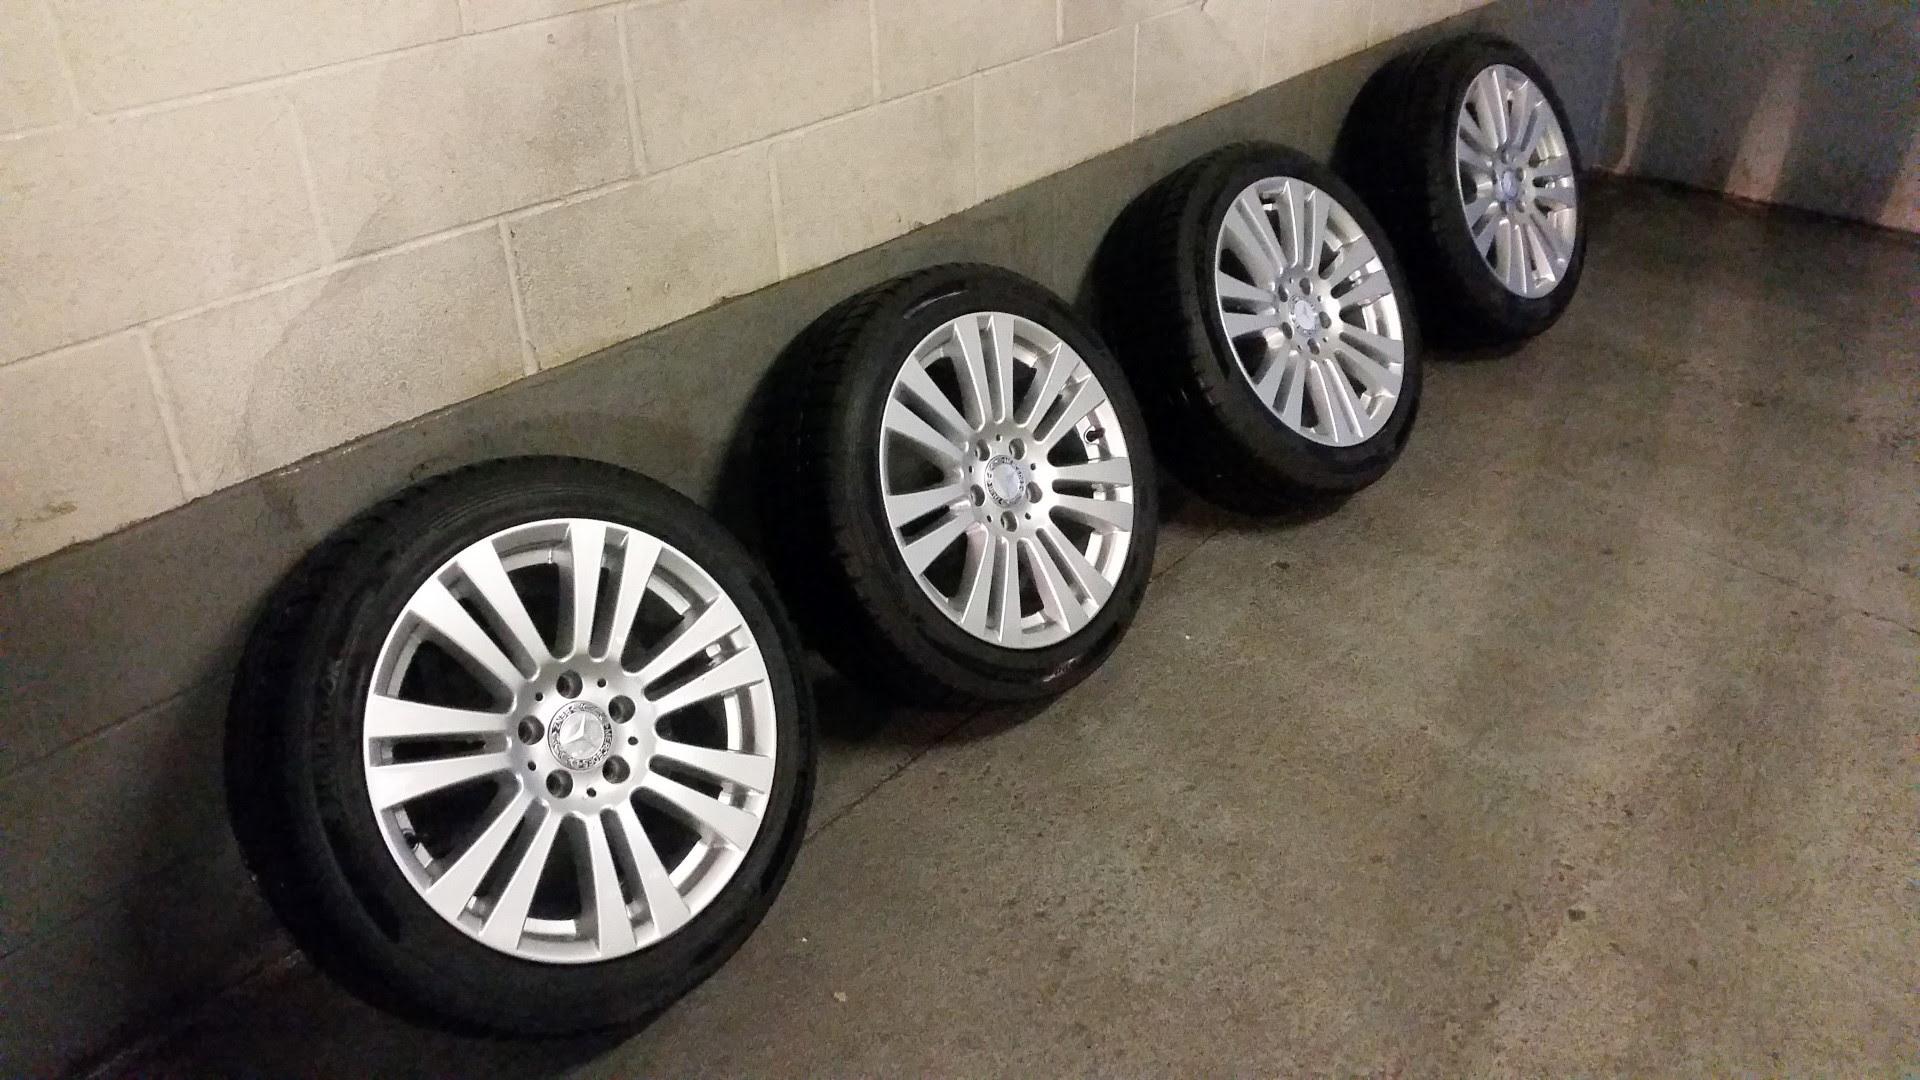 Oem Alloy Wheels Tires Winter  750 00 Toronto Gta Mbworld Org Forums